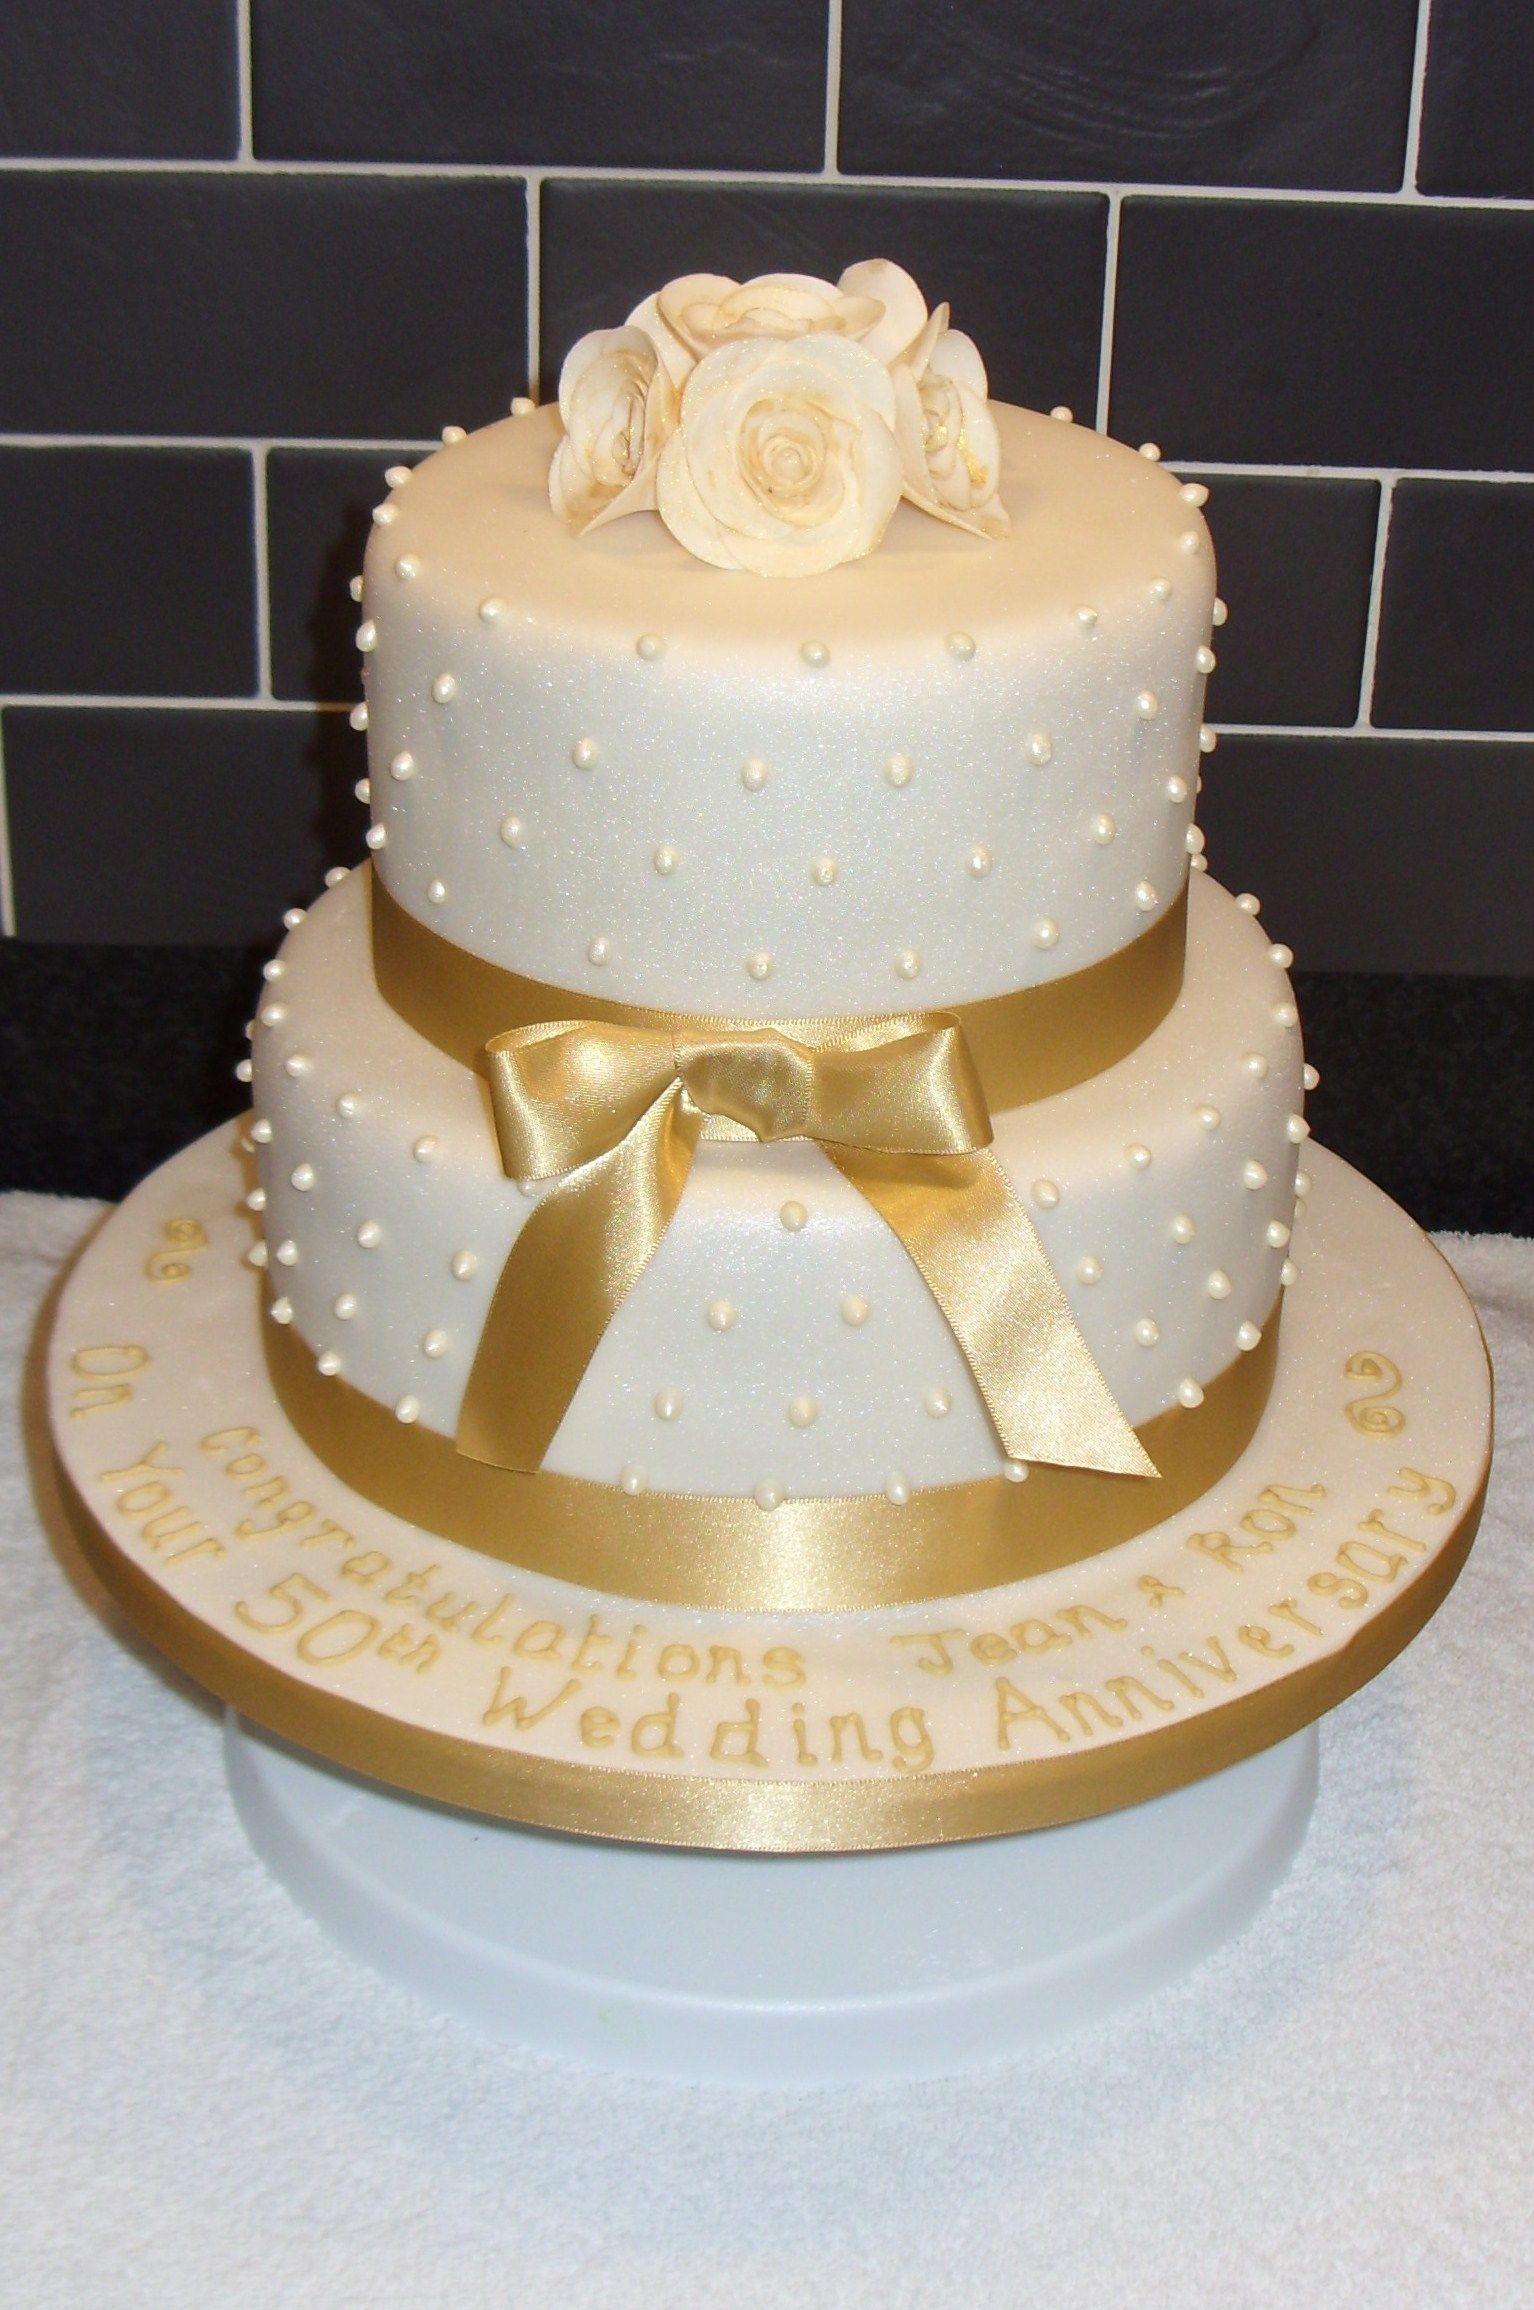 Golden Wedding Anniversary Cake 50th wedding anniversary